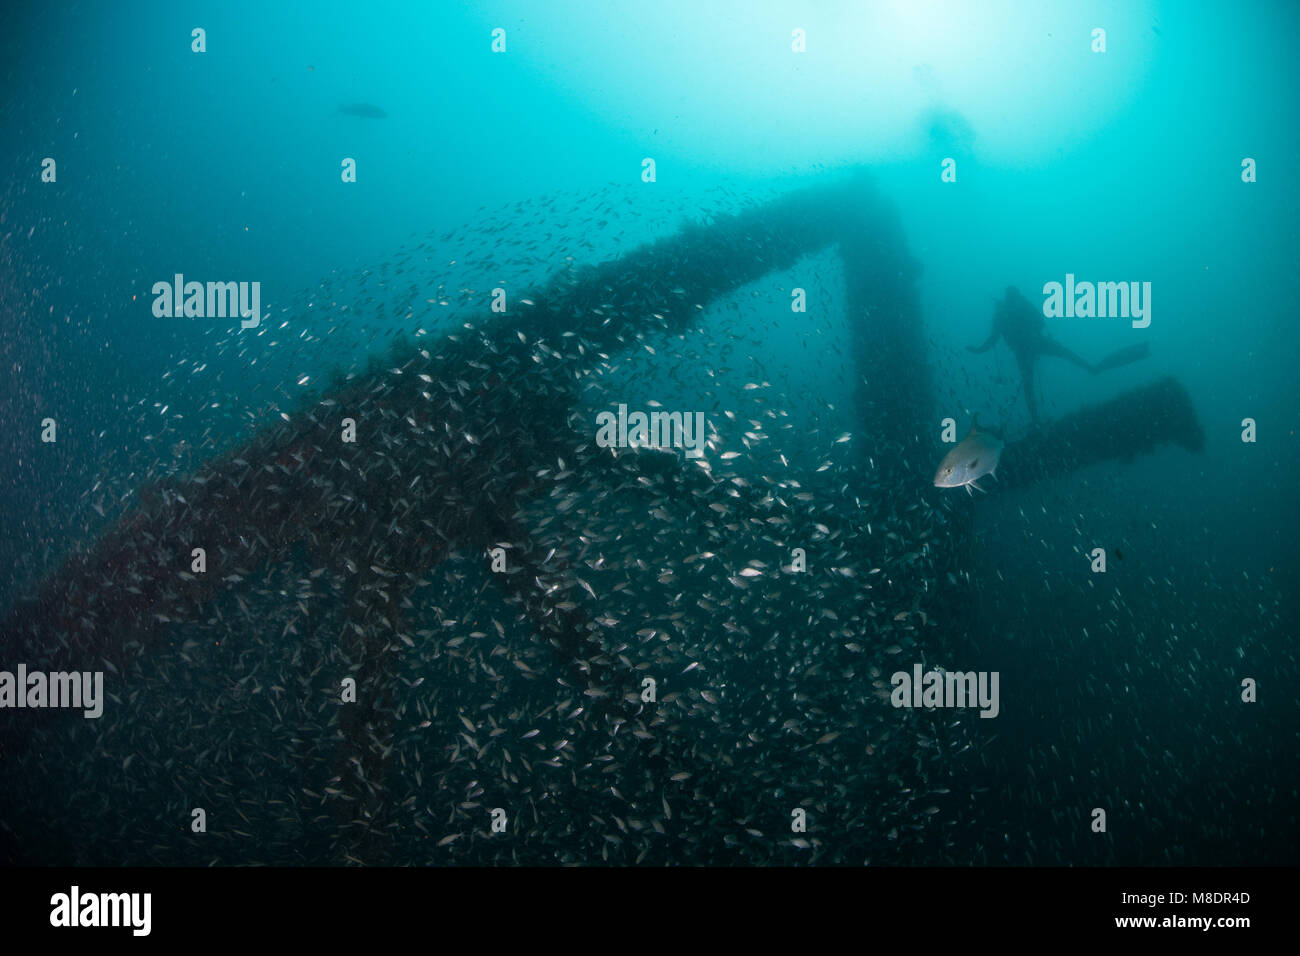 School of fish and scuba diver exploring sunken ship, Cancun, Mexico - Stock Image